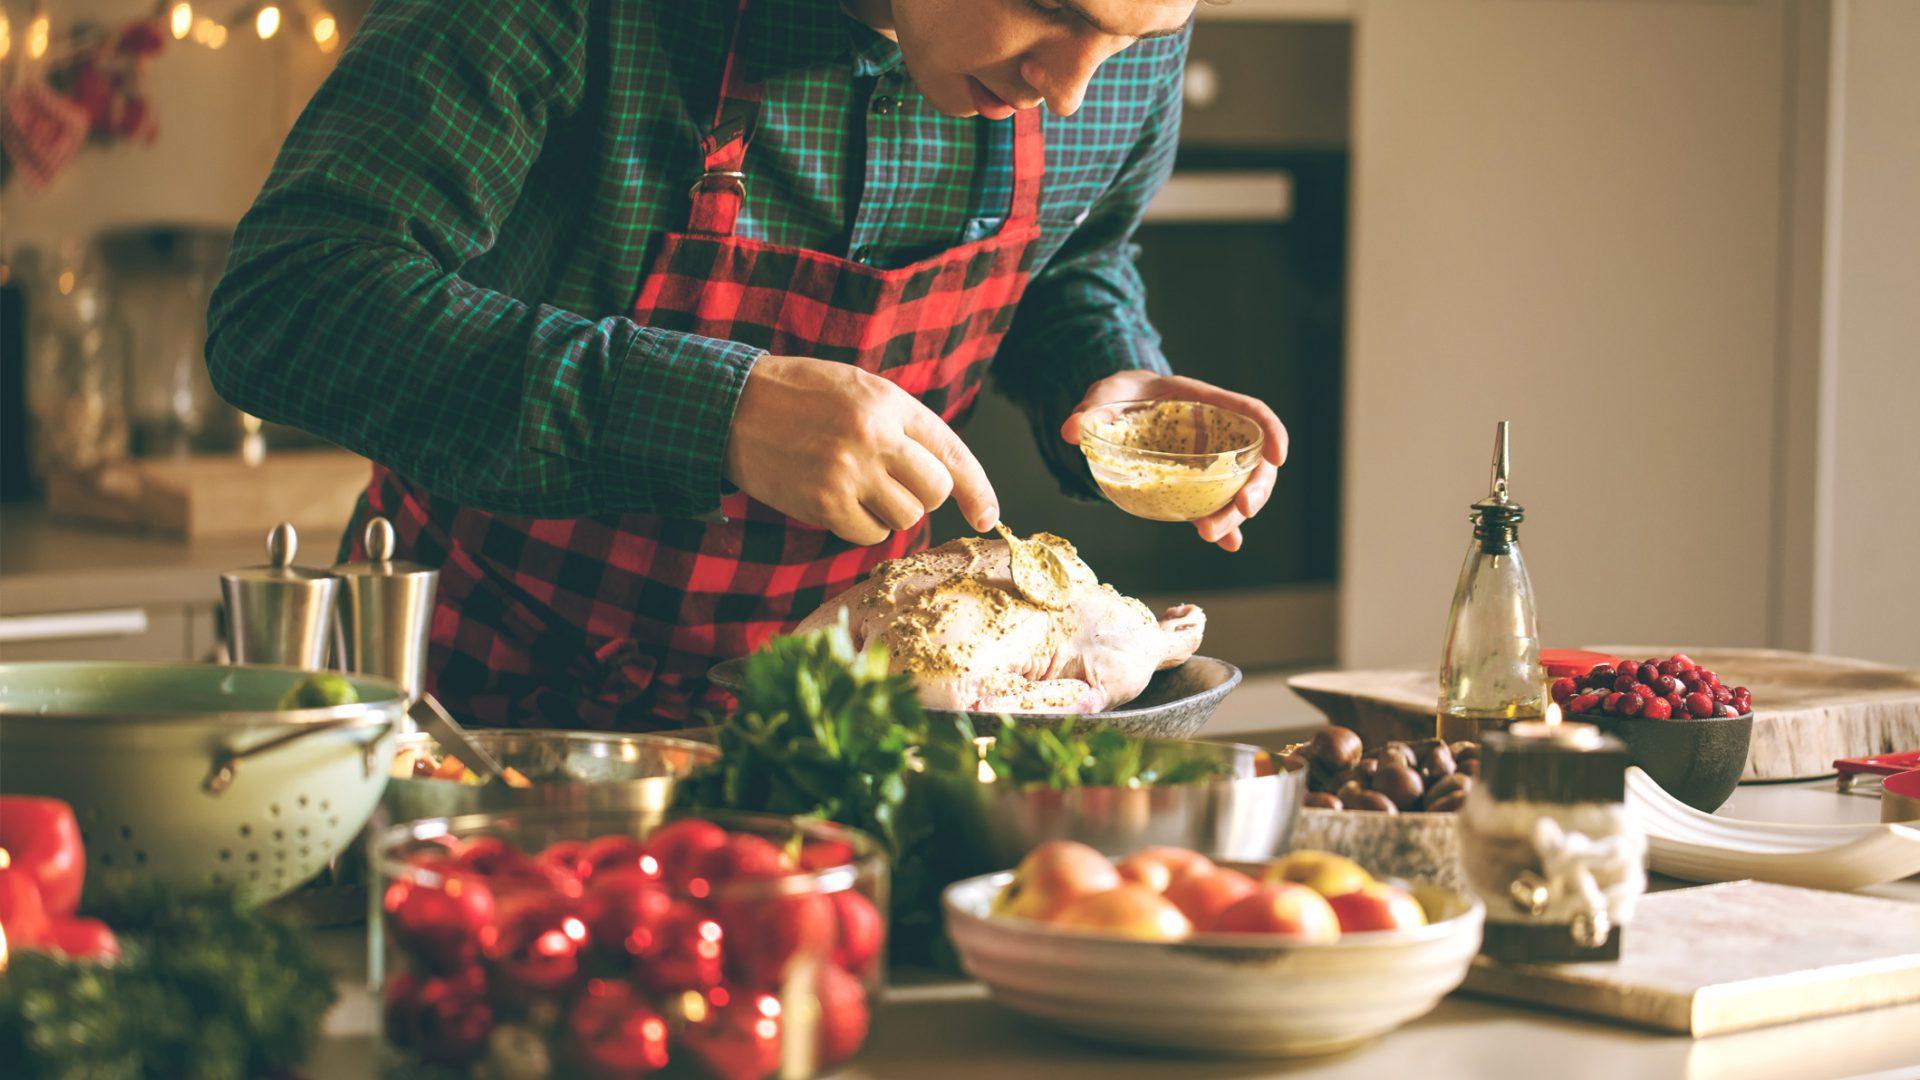 Top 5 Healthy Alternatives To Christmas Classics